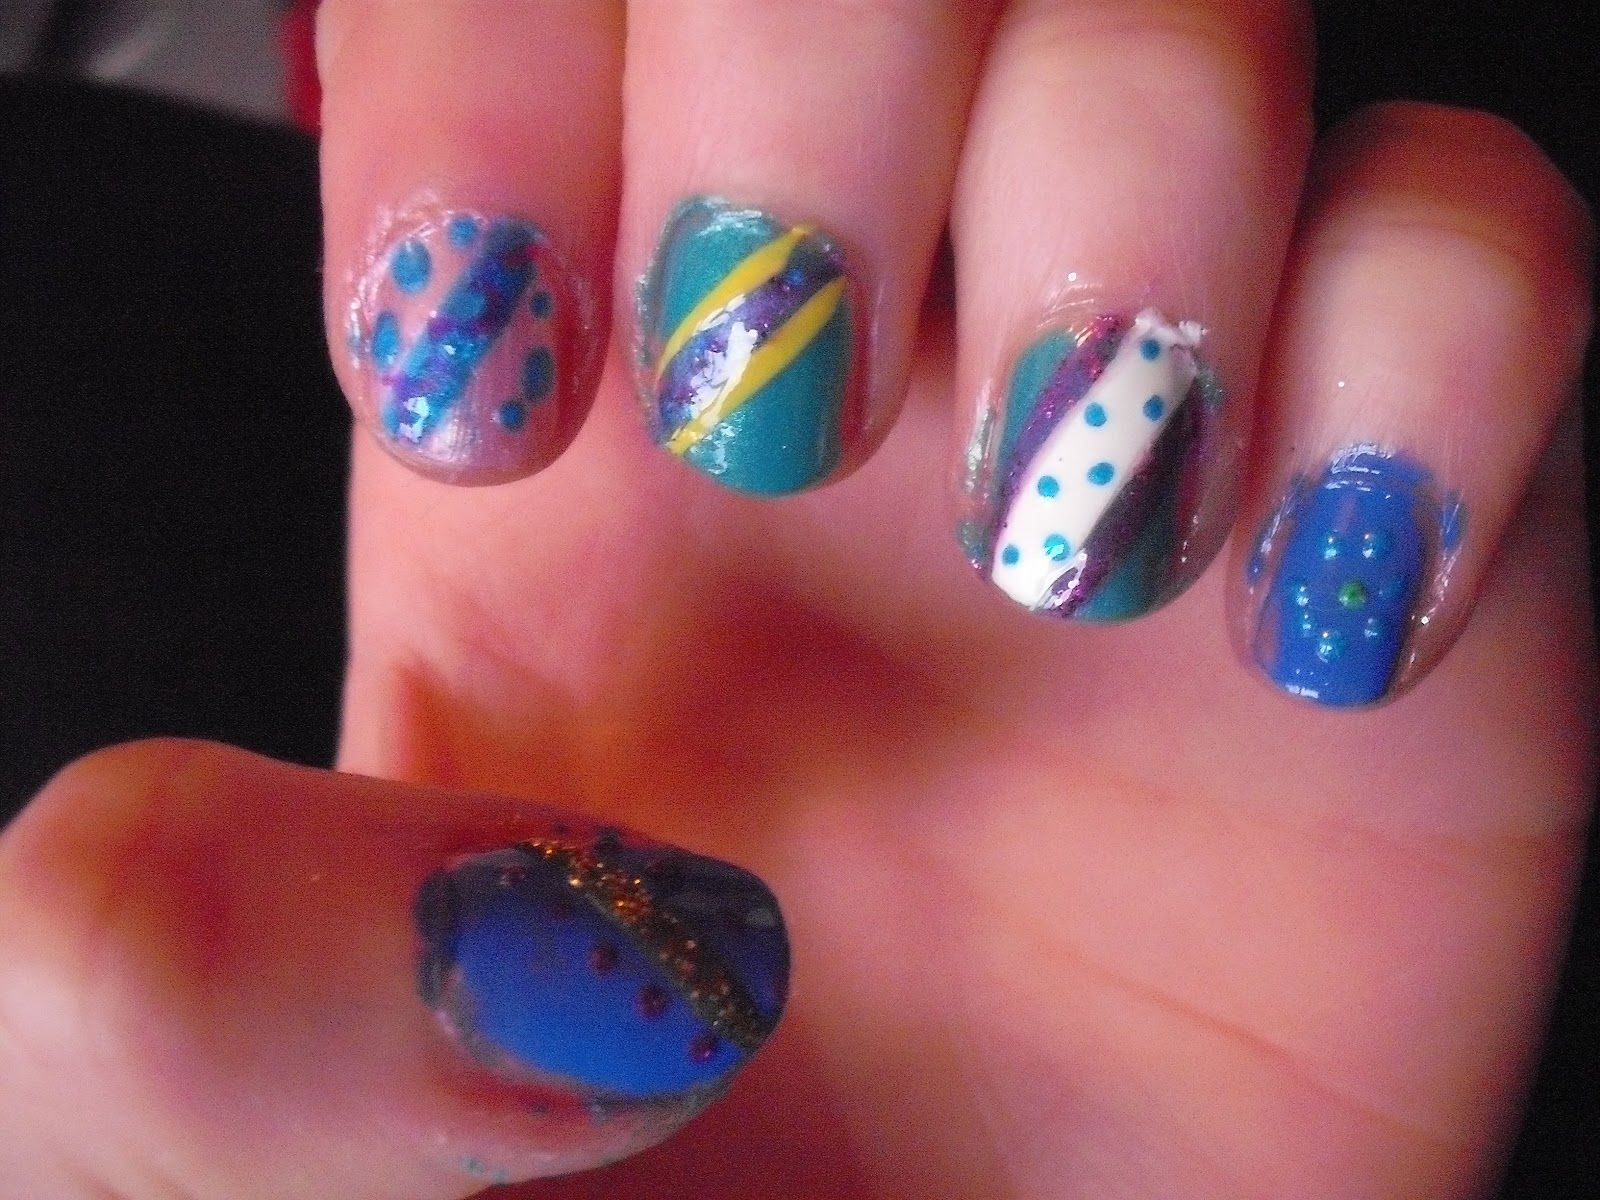 nail art candy design | Nail Art Ideas | 2015 Nail Art Idea ...